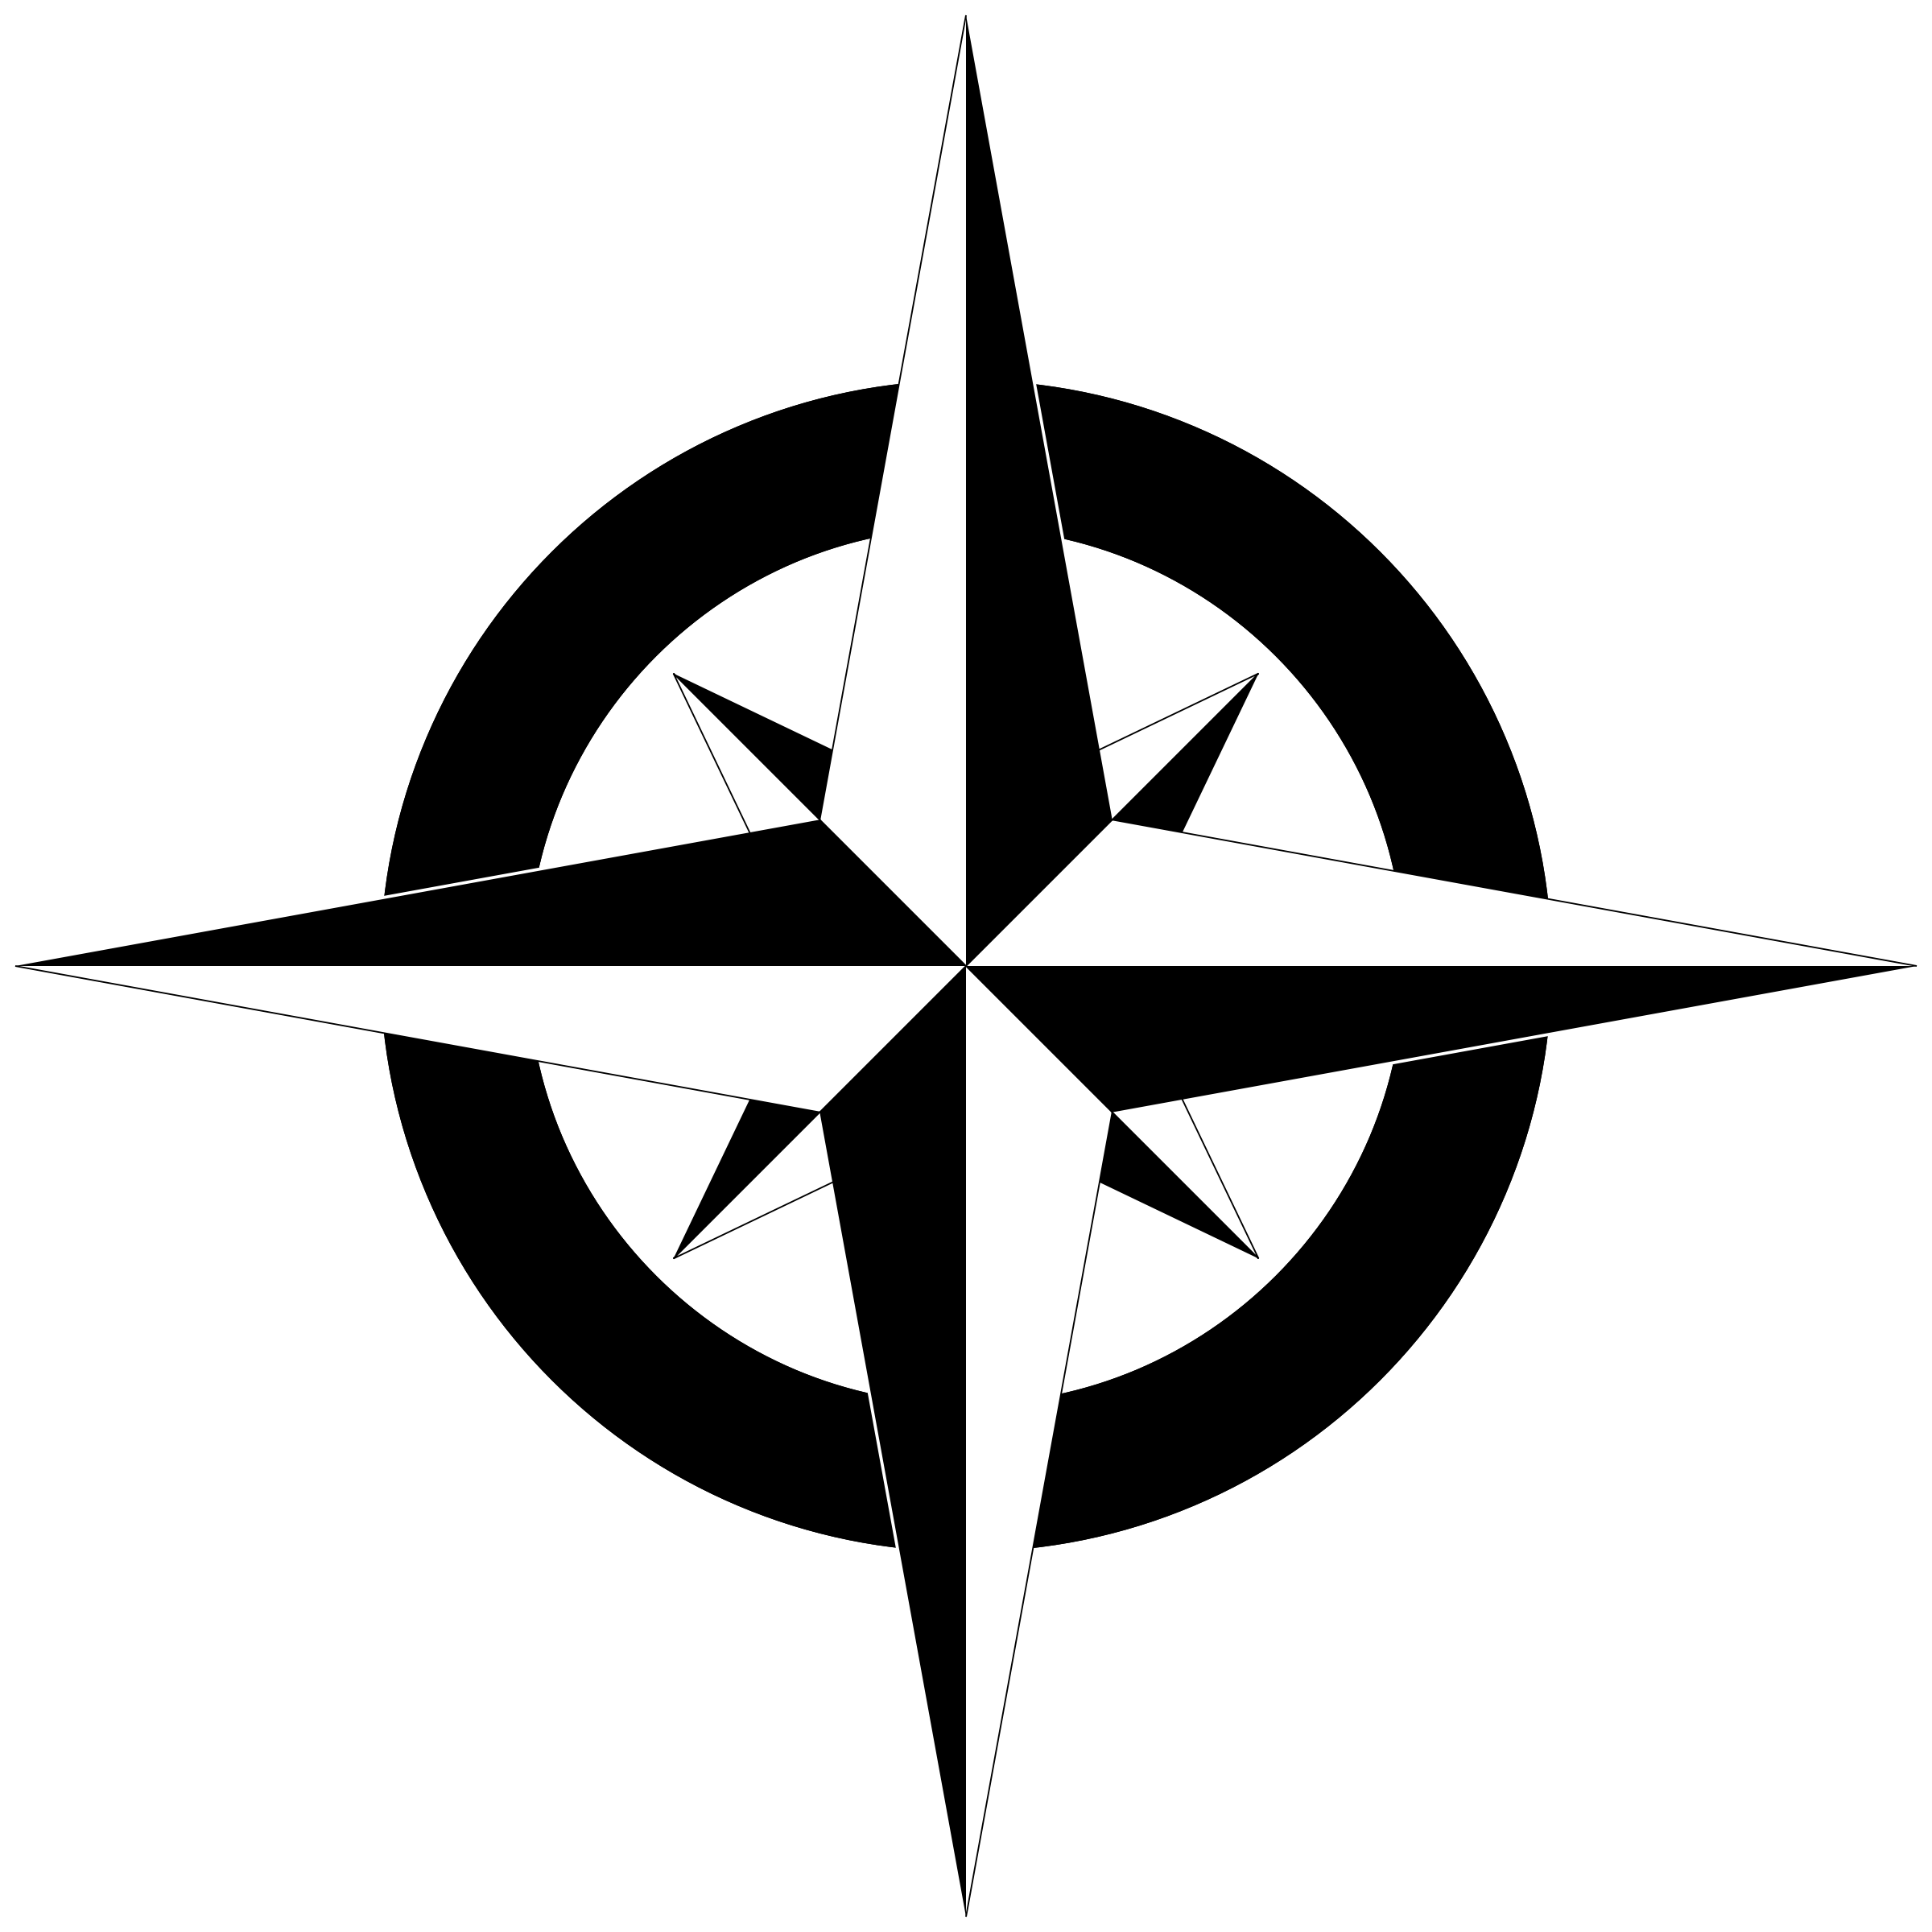 Clipart Compass Rose Free; Simple Compas-Clipart compass rose free; Simple Compass Rose Clip Art - ClipArt Best ...-0